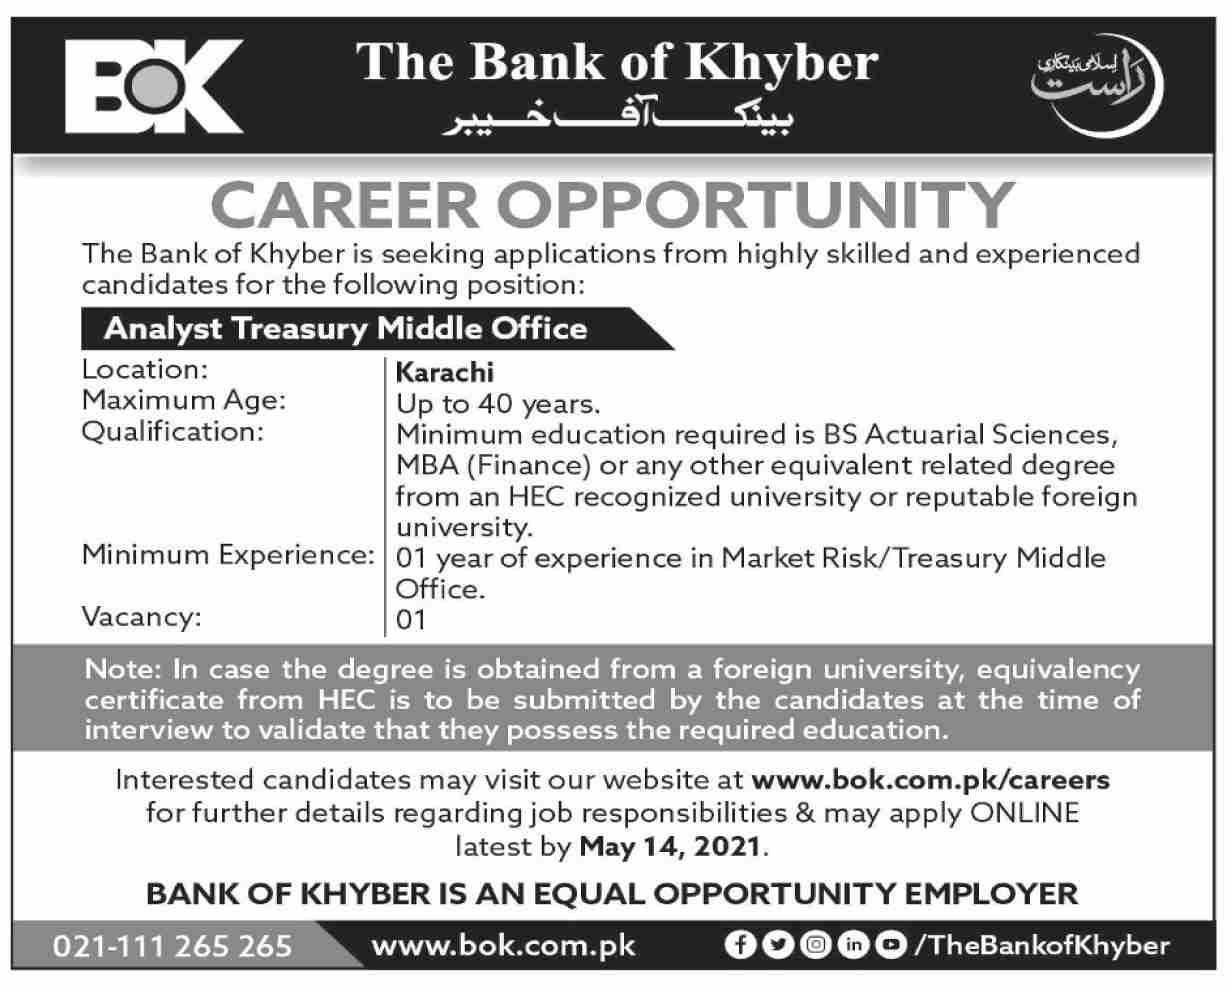 www.bok.com.pk/careers - Bank of Khyber (BOK) Jobs 2021 in Pakistan